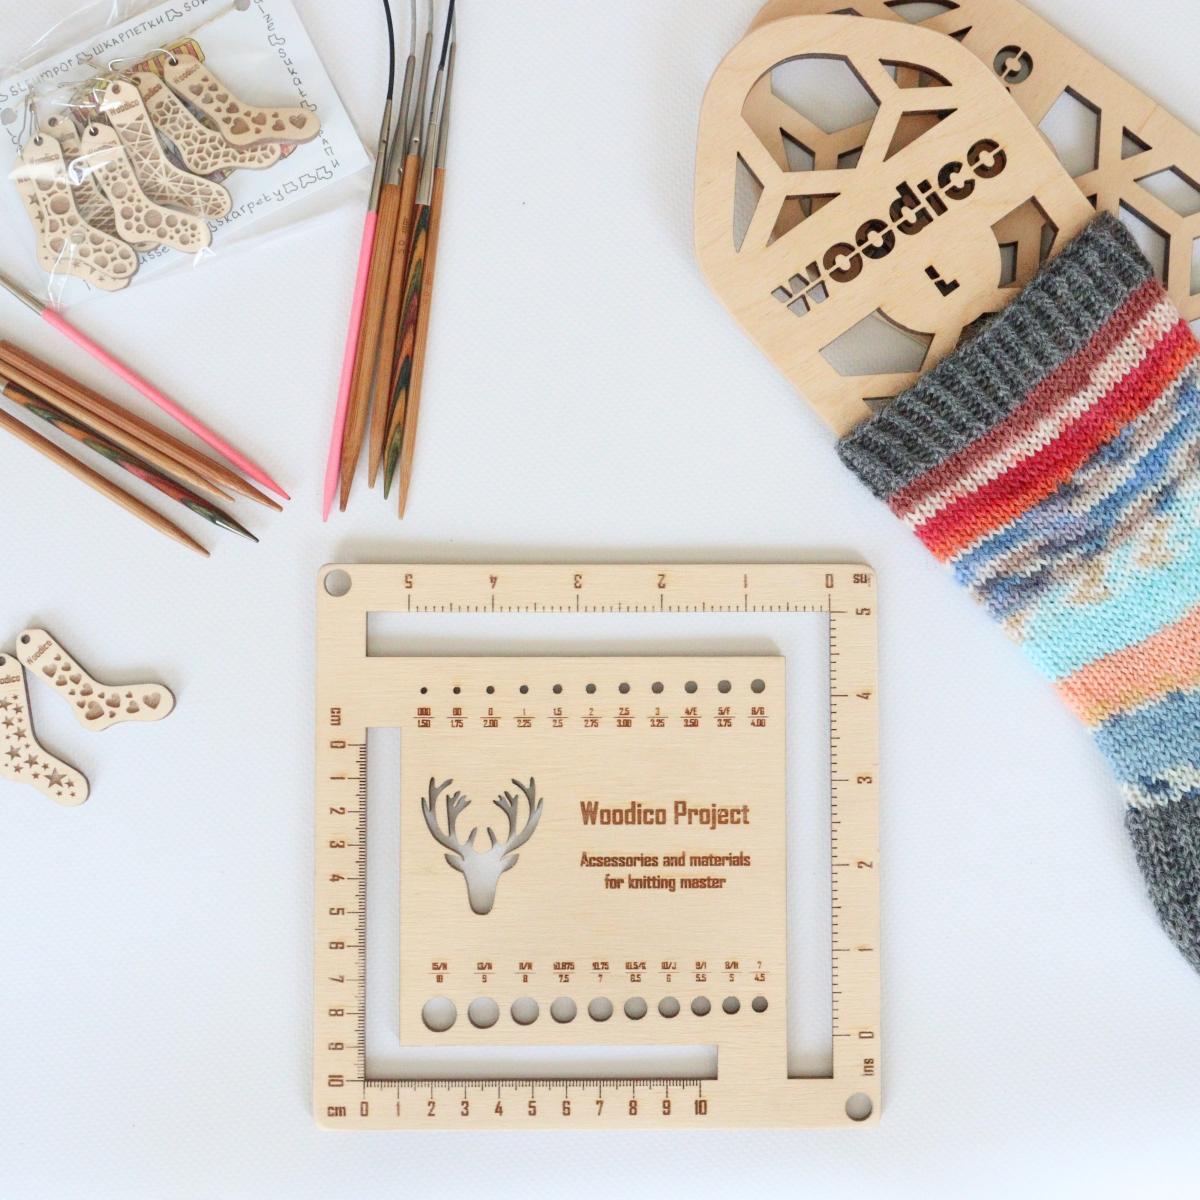 woodico.pro knitmetr 2 1200x1200 - Knitting needle gauge and ruler / Knitmetr